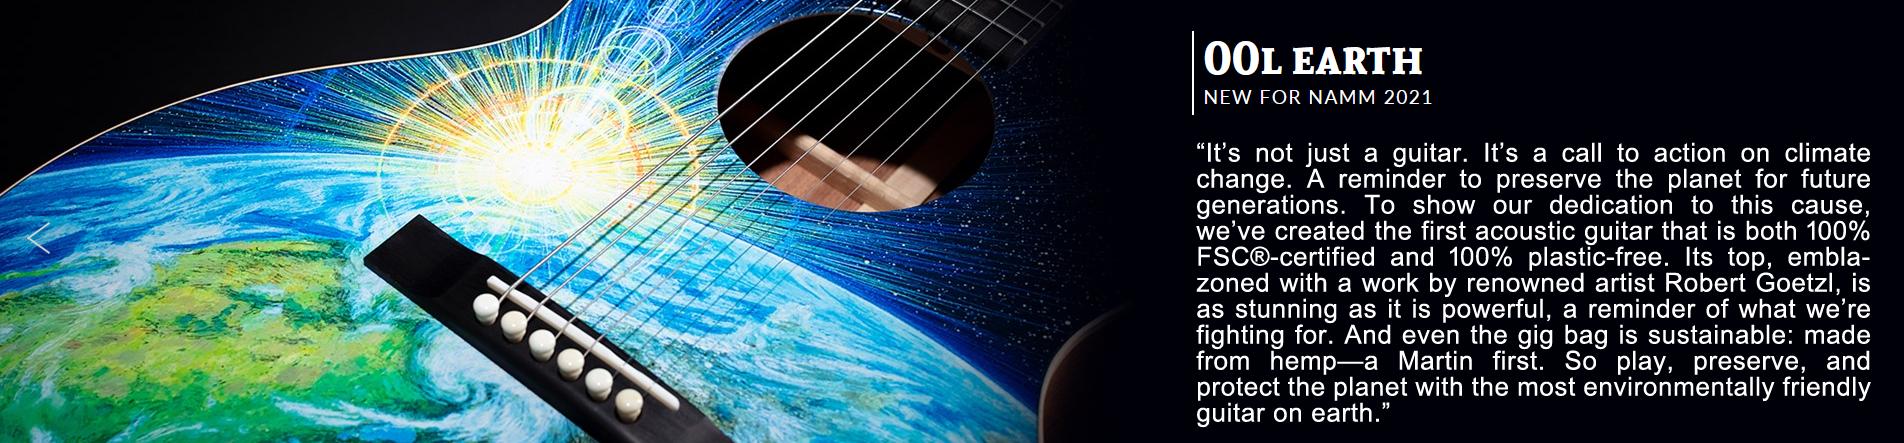 Martin 00L Earth One Man's Guitar onemanz art